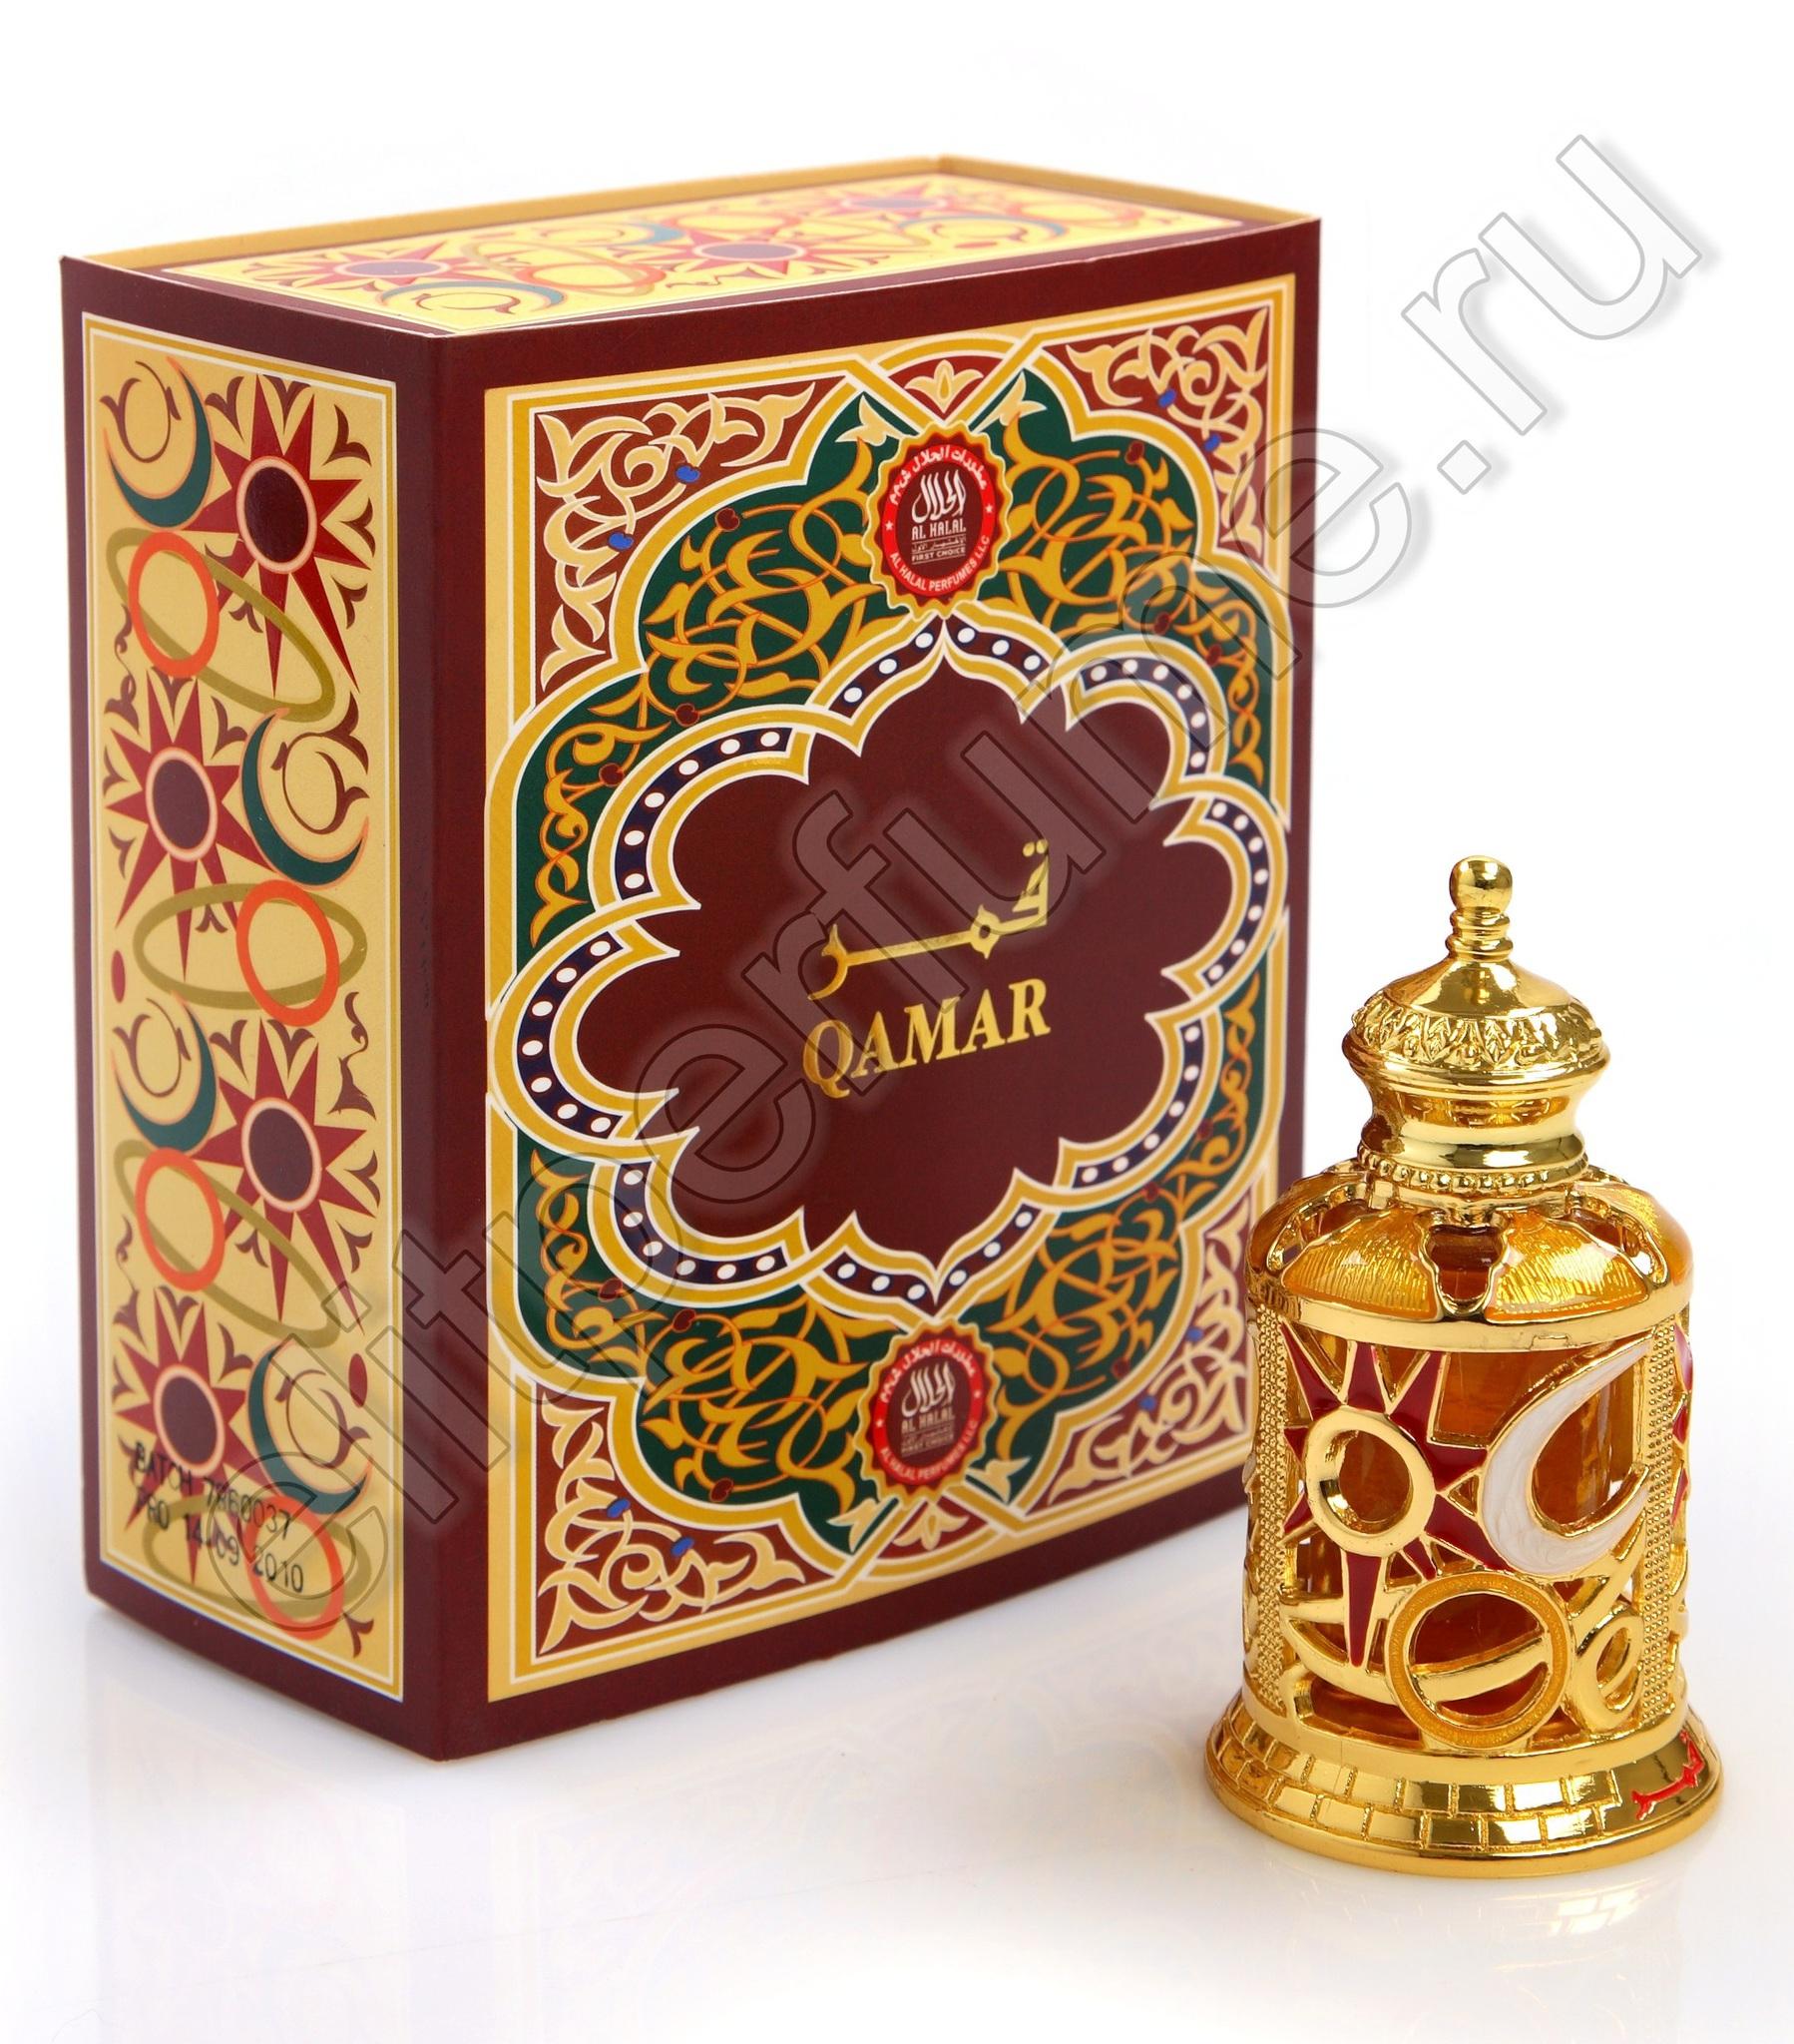 Пробники для Камар Qamar 1 мл арабские масляные духи от Аль Харамайн Al Haramin Perfumes